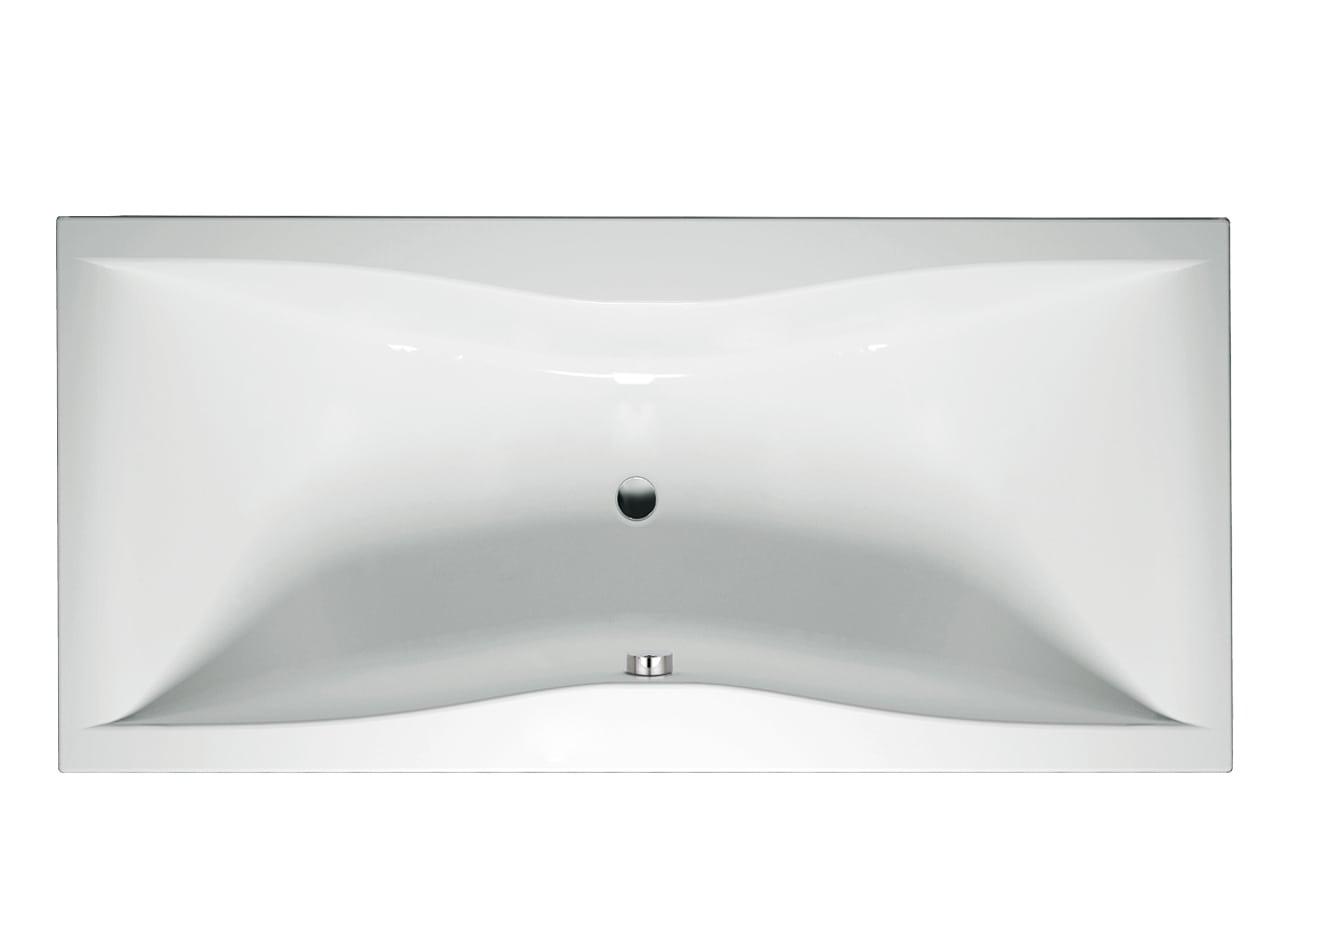 Vasca Da Bagno Incasso 190x90 : Dimensioni vasca da bagno modelli per tutti vasche da bagno